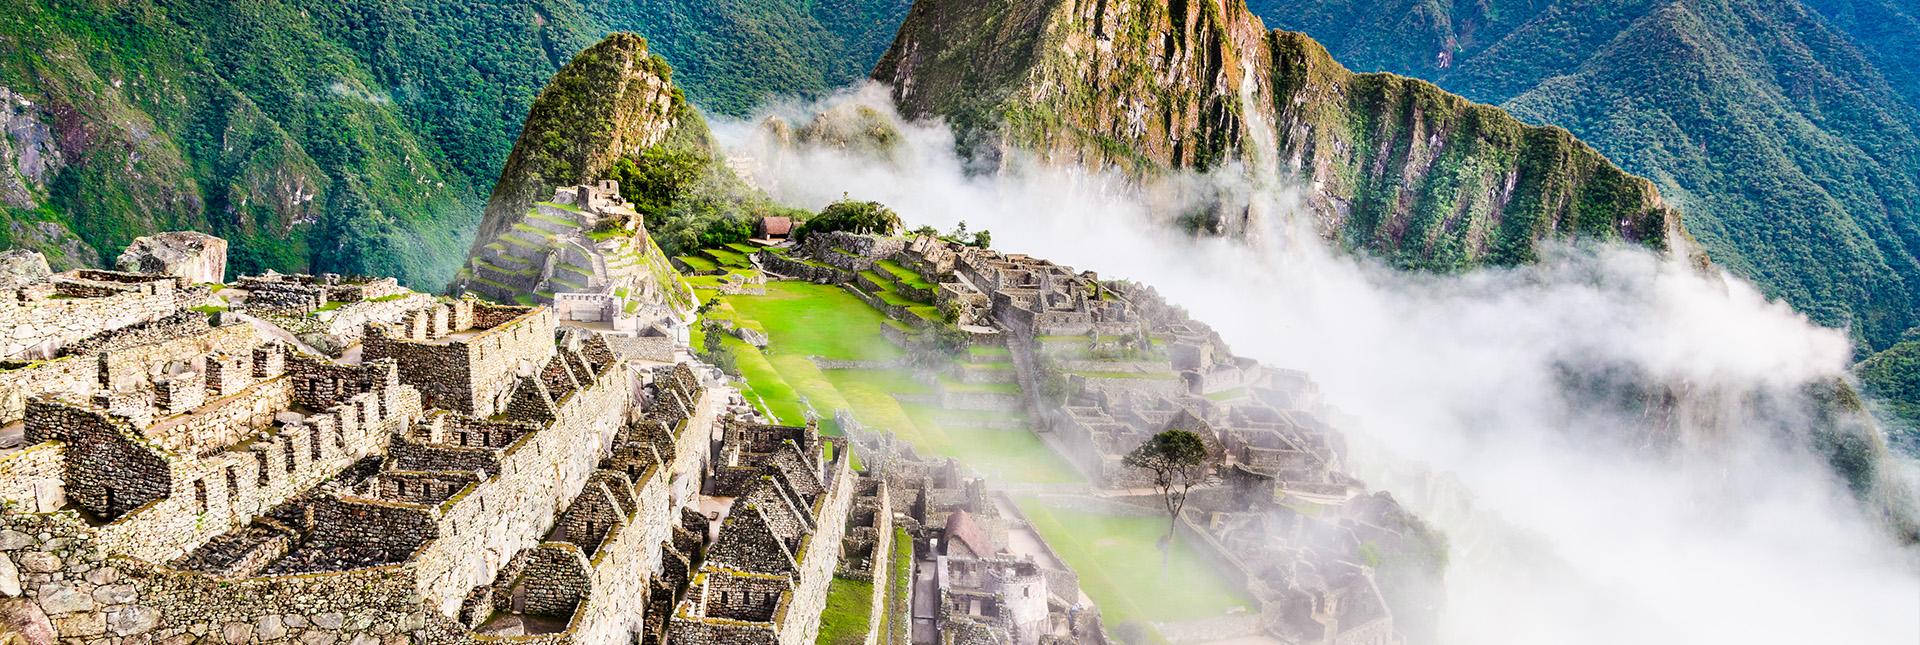 View of Inca ruins at Machu Picchu